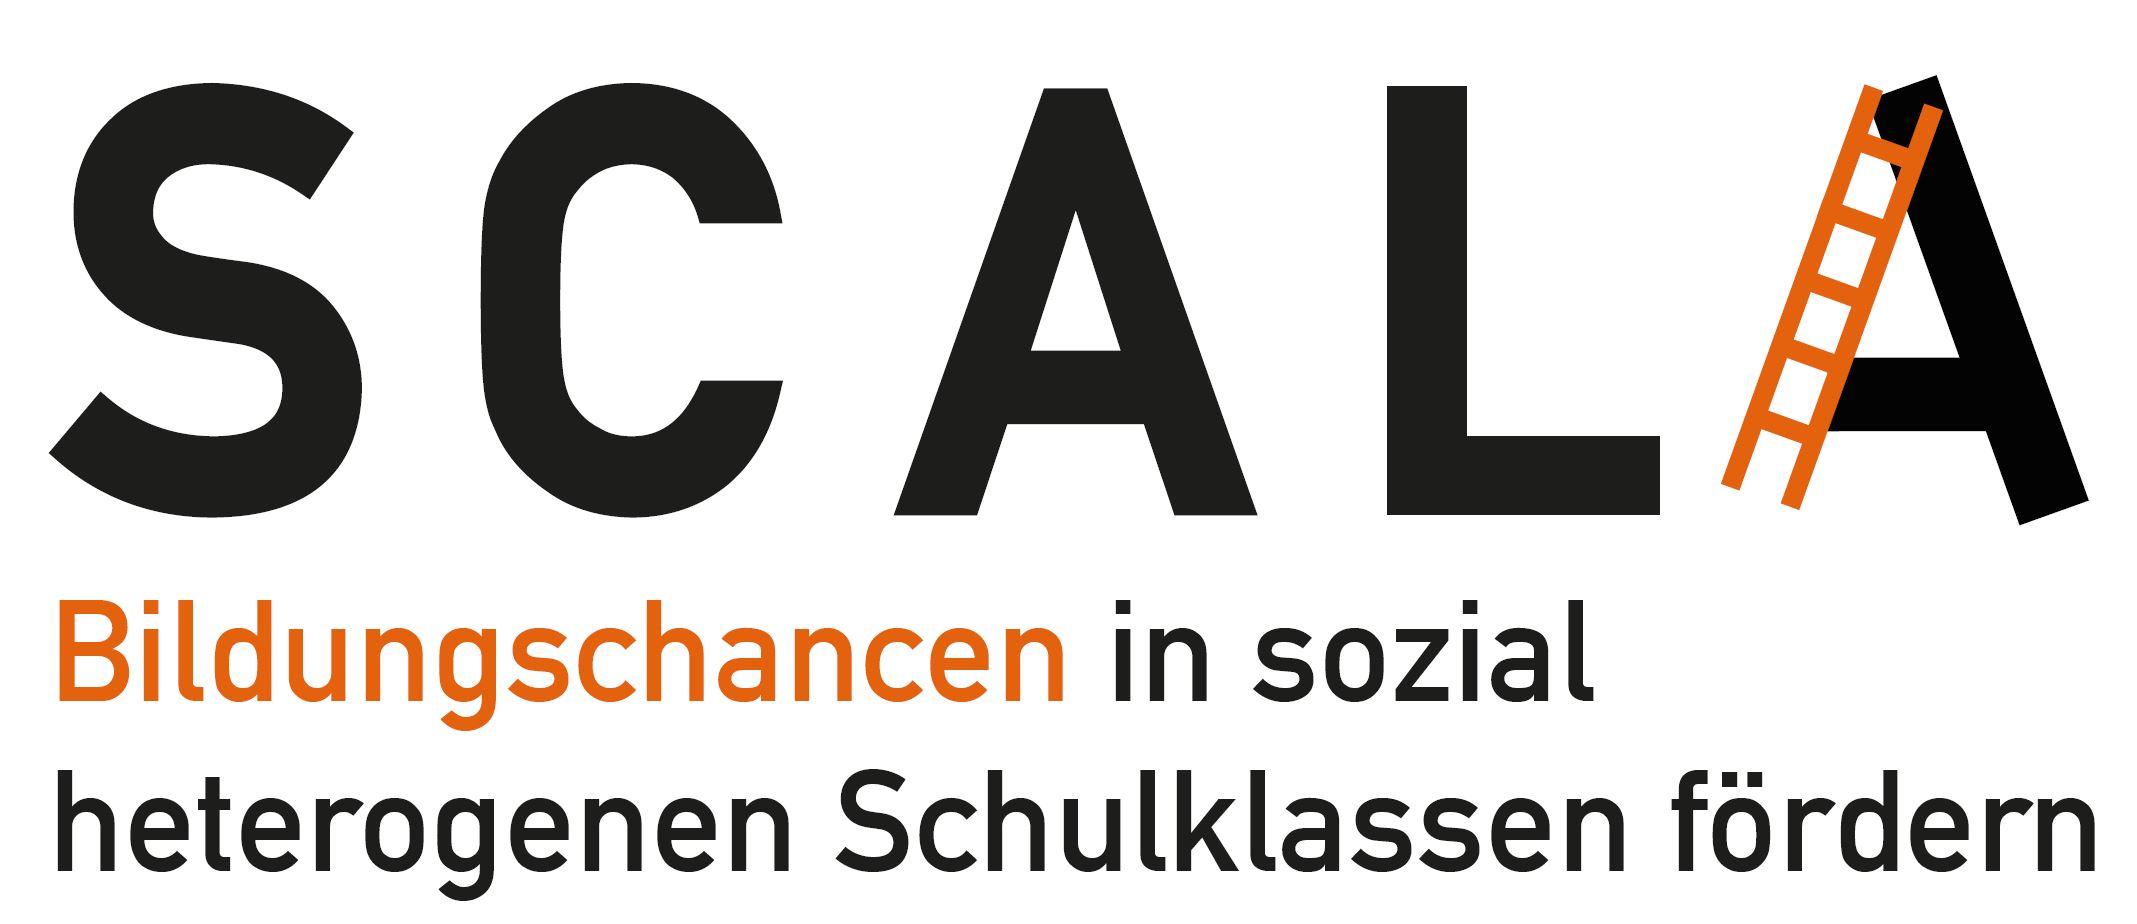 SCALA_Logo.JPG